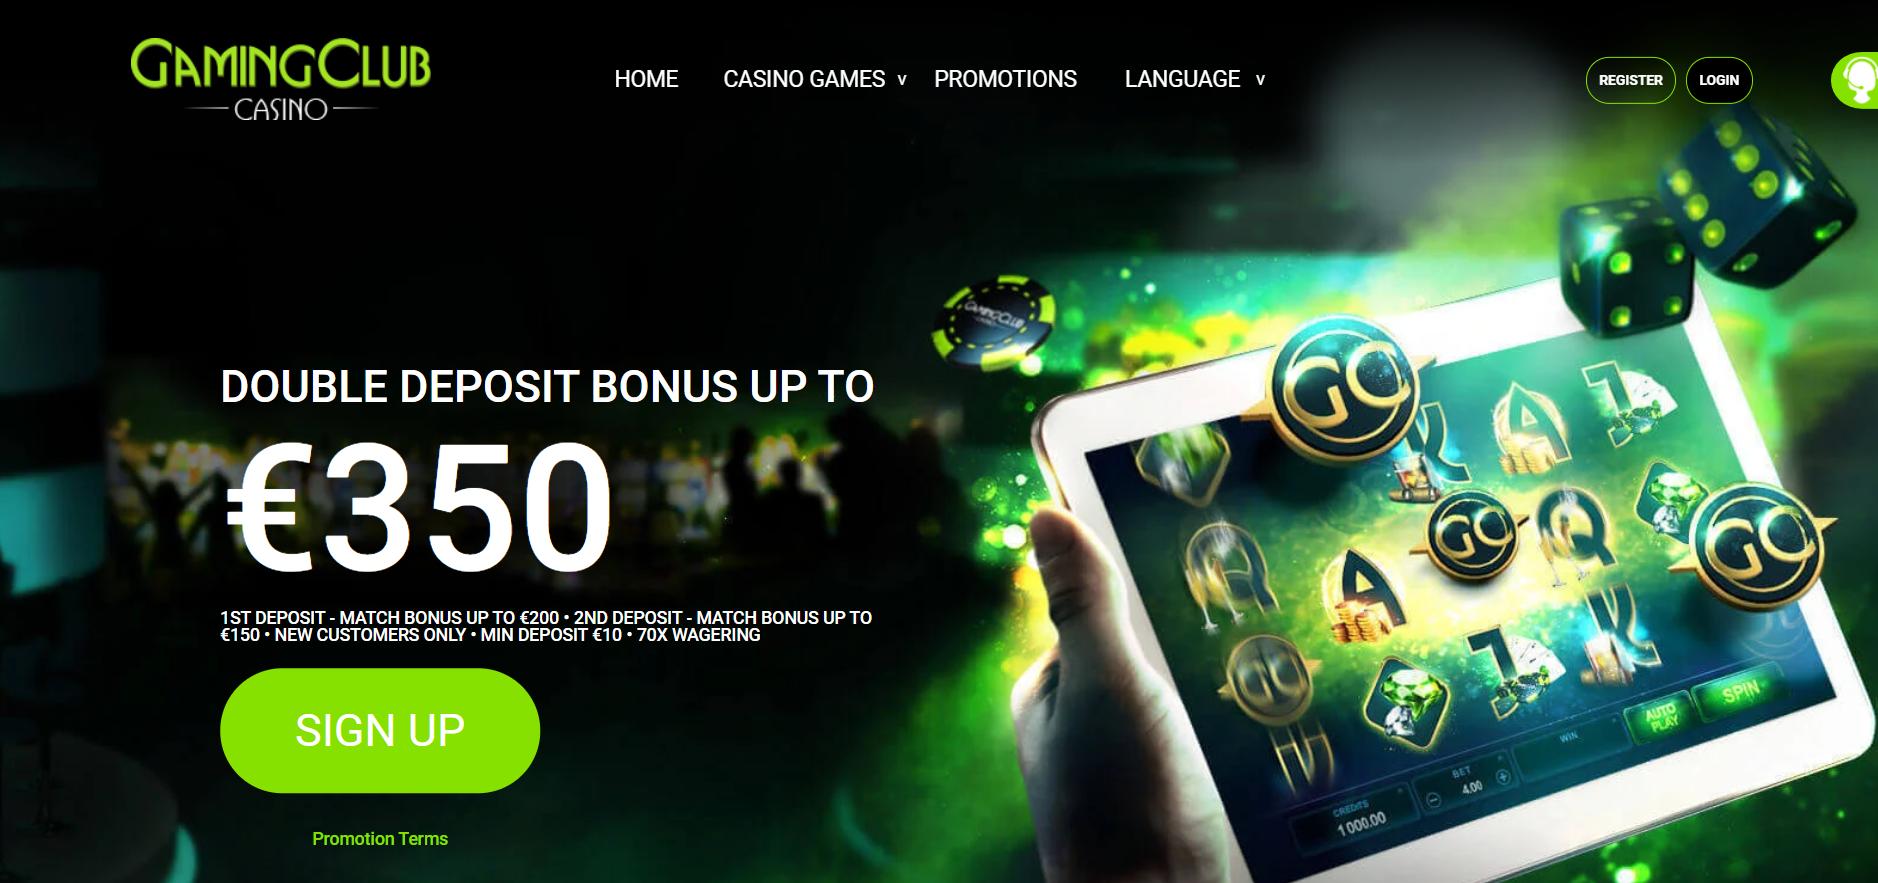 Gamingclub casino betfair lay 49213